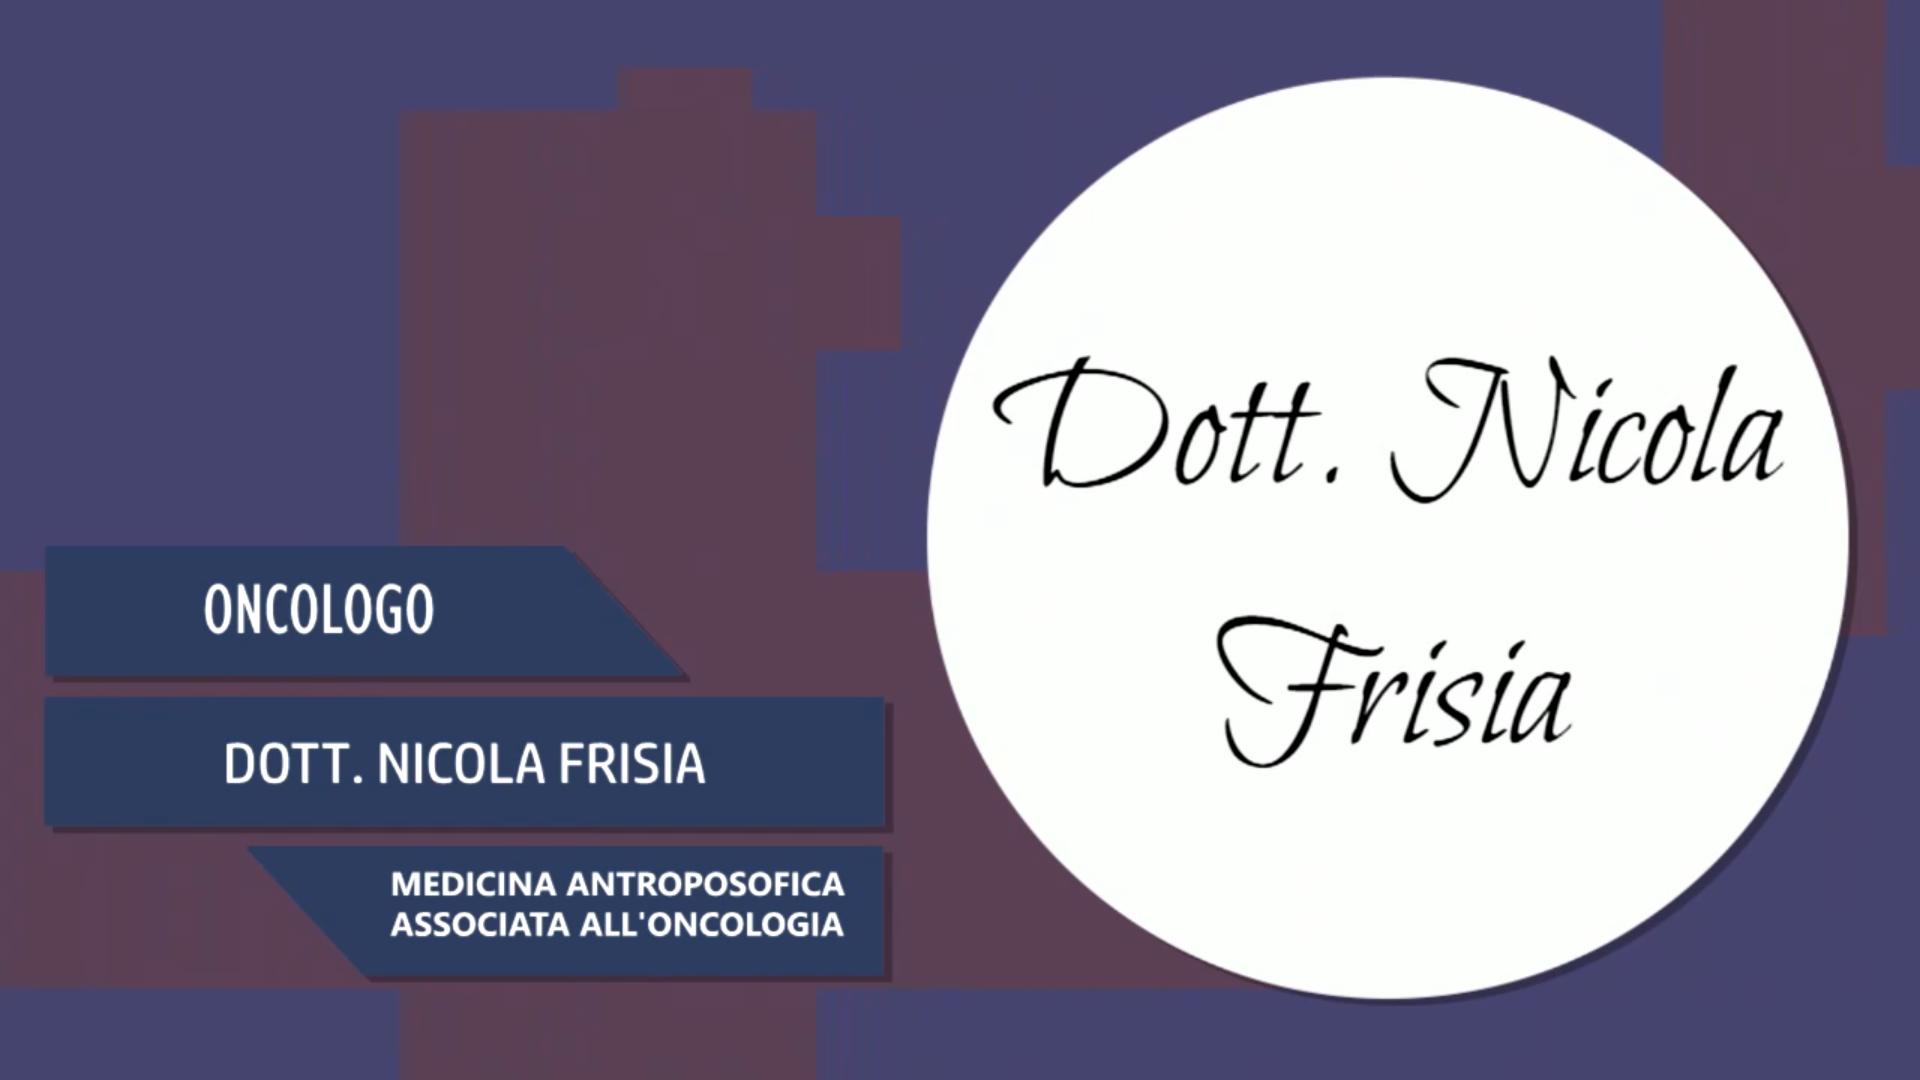 Intervista alla Dott.ssa Nicola Frisia – Medicina antropofisica associata all'oncologia